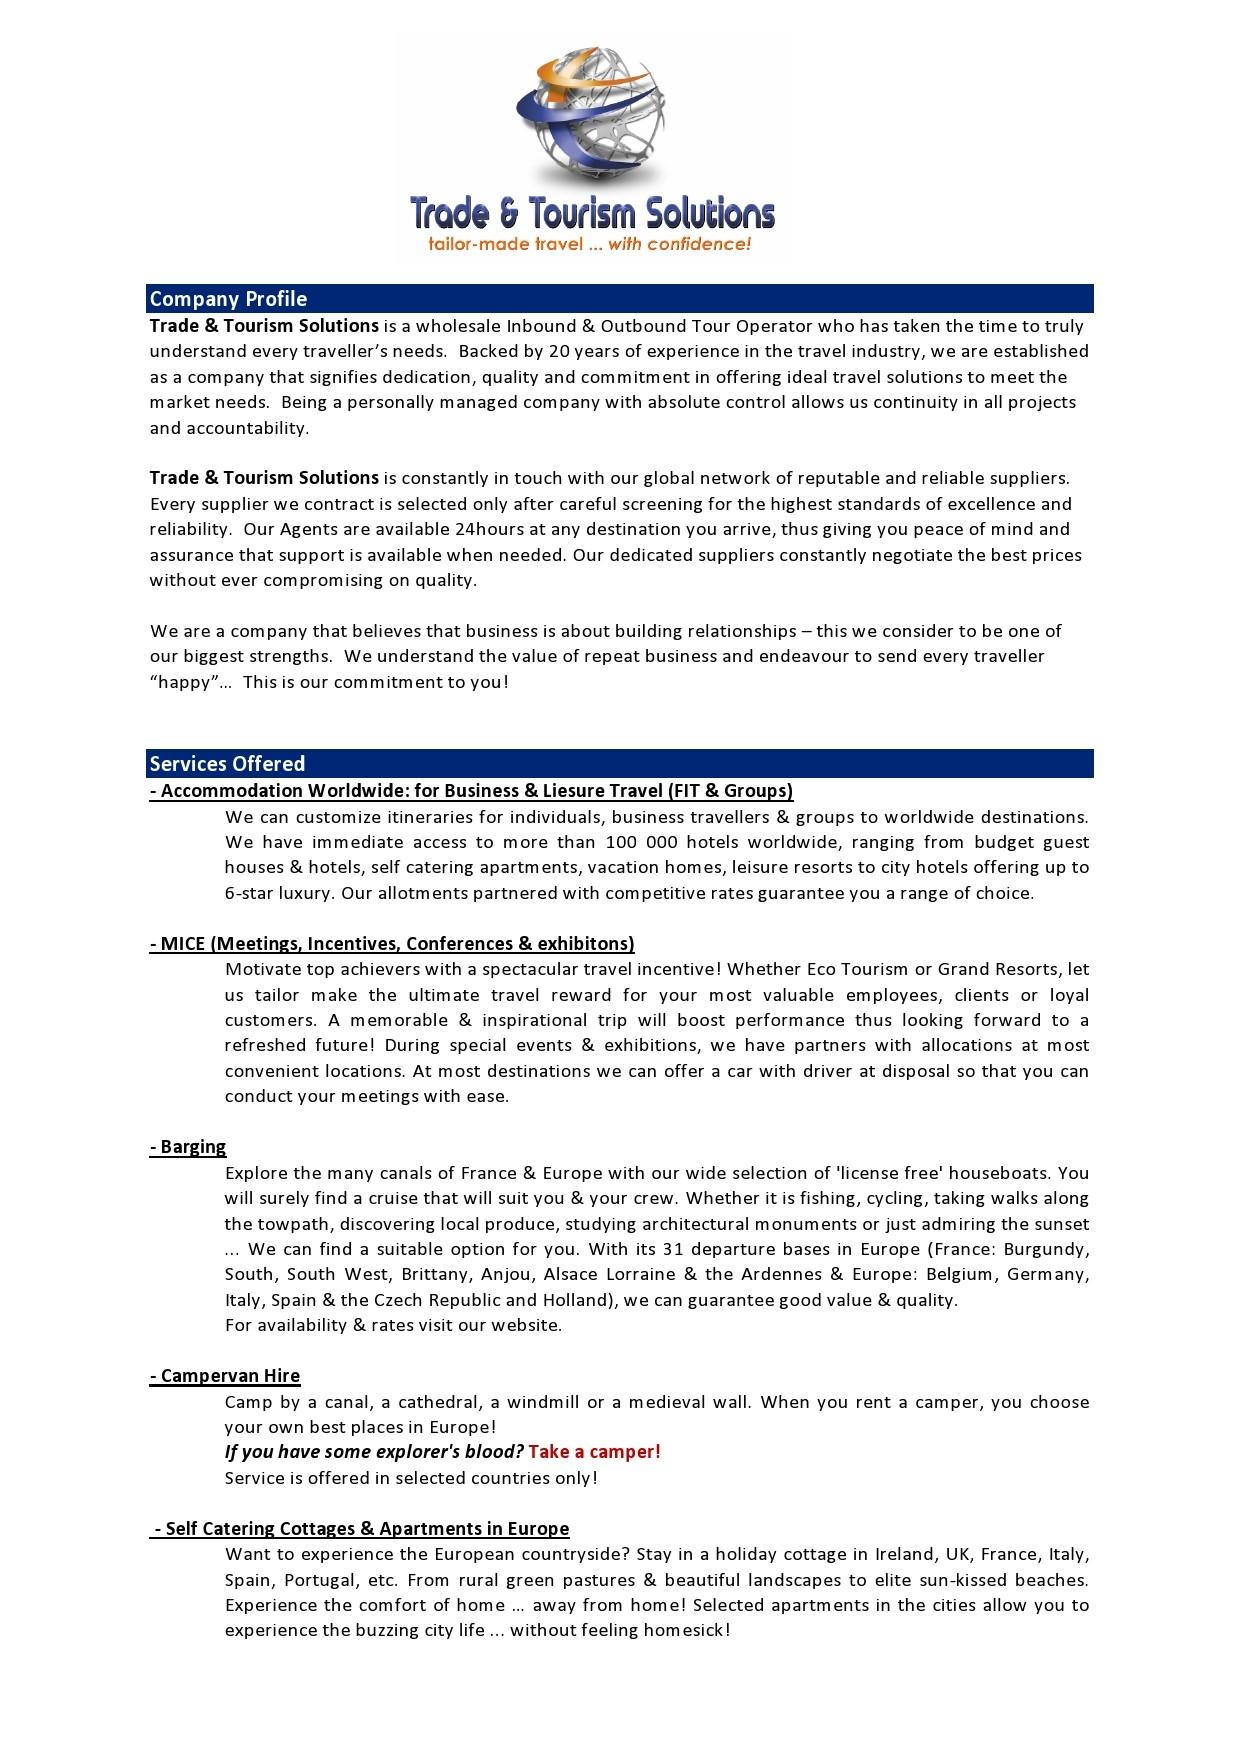 Free company profile template 27